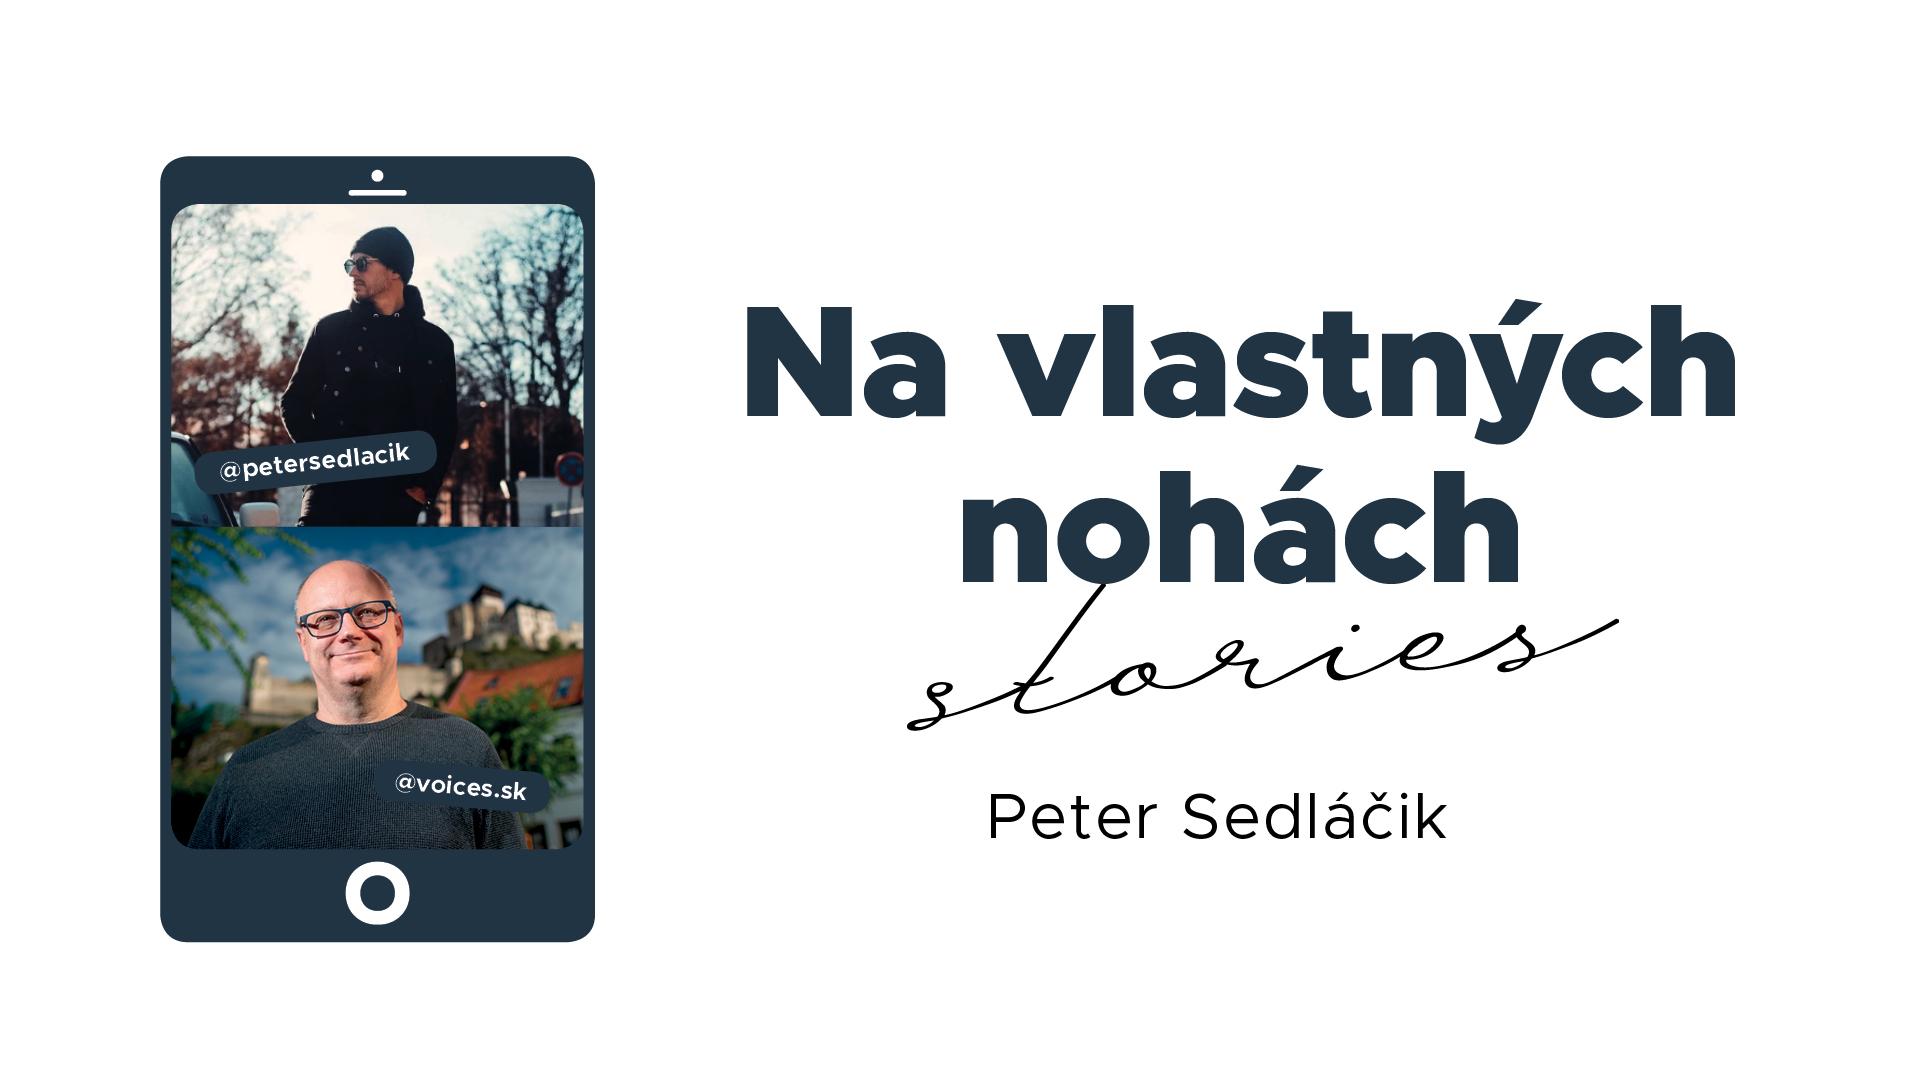 Na vlastných nohách stories_ilustračný obrázok Peter Sedláčik